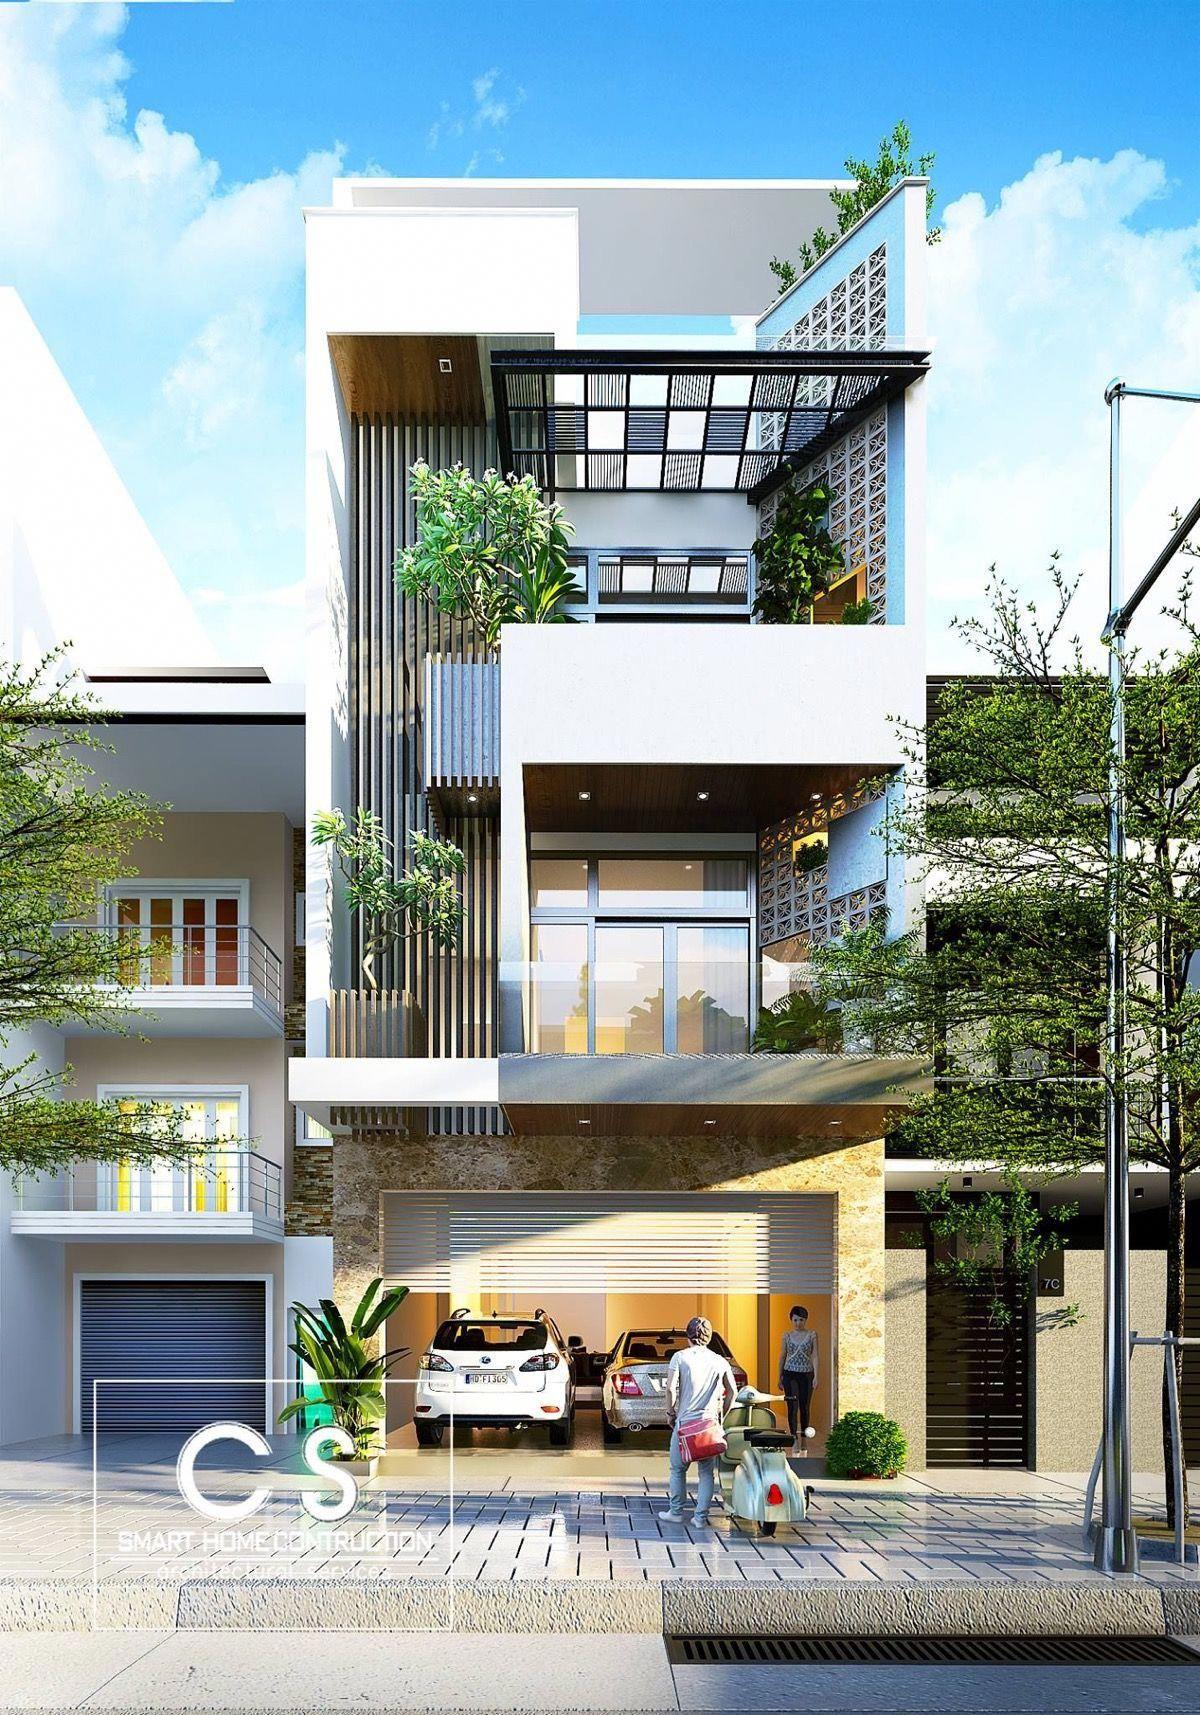 50 Narrow Lot Houses That Transform A Skinny Exterior Into ...